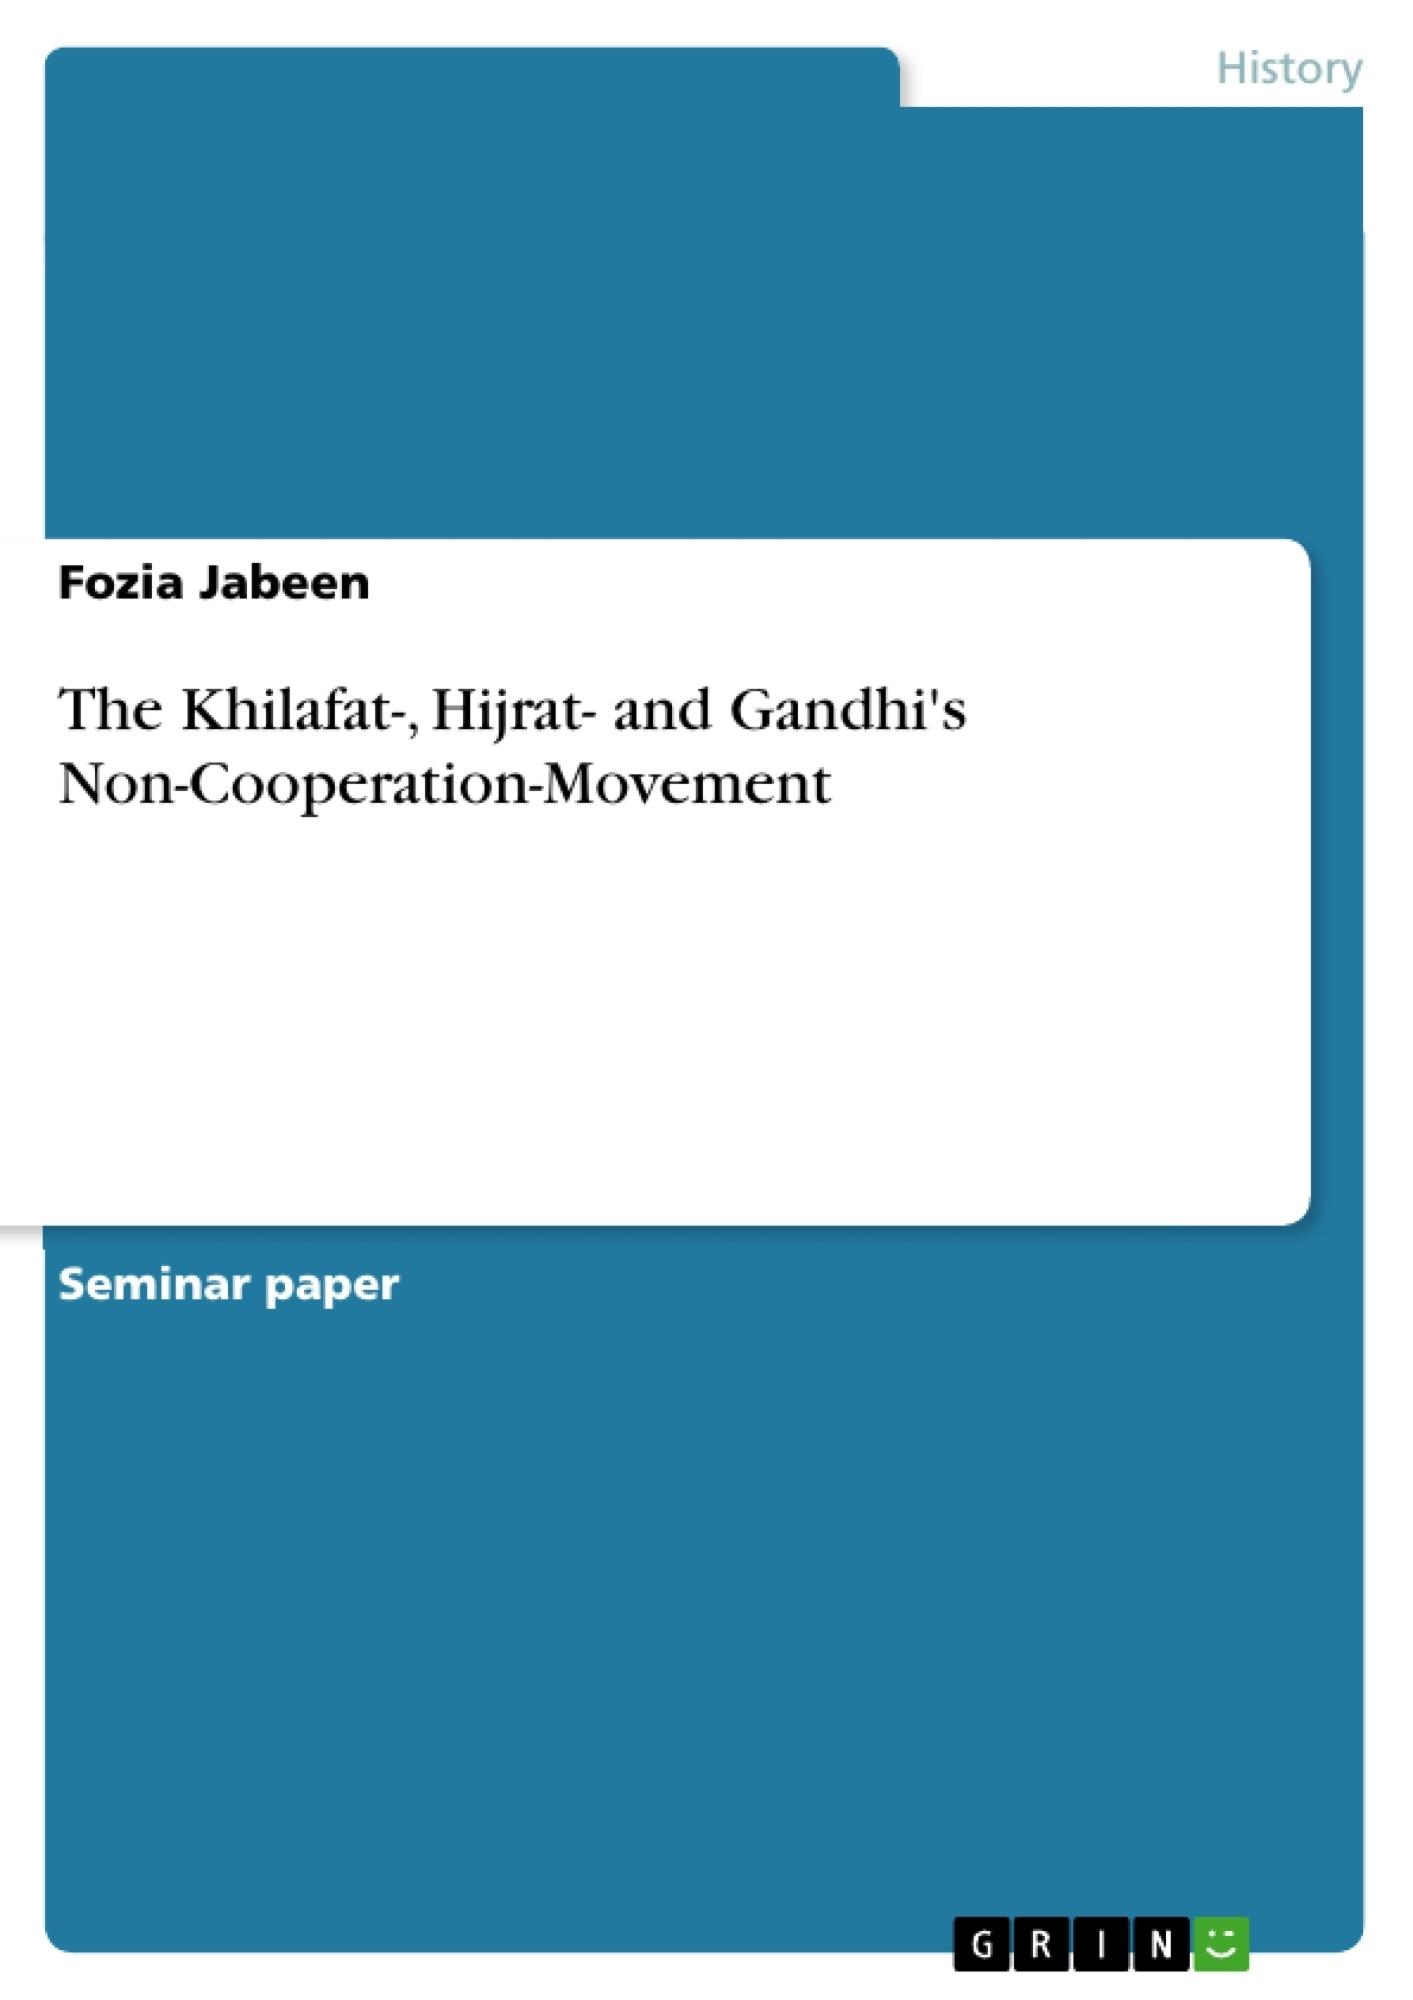 Title: The Khilafat-, Hijrat- and Gandhi's Non-Cooperation-Movement